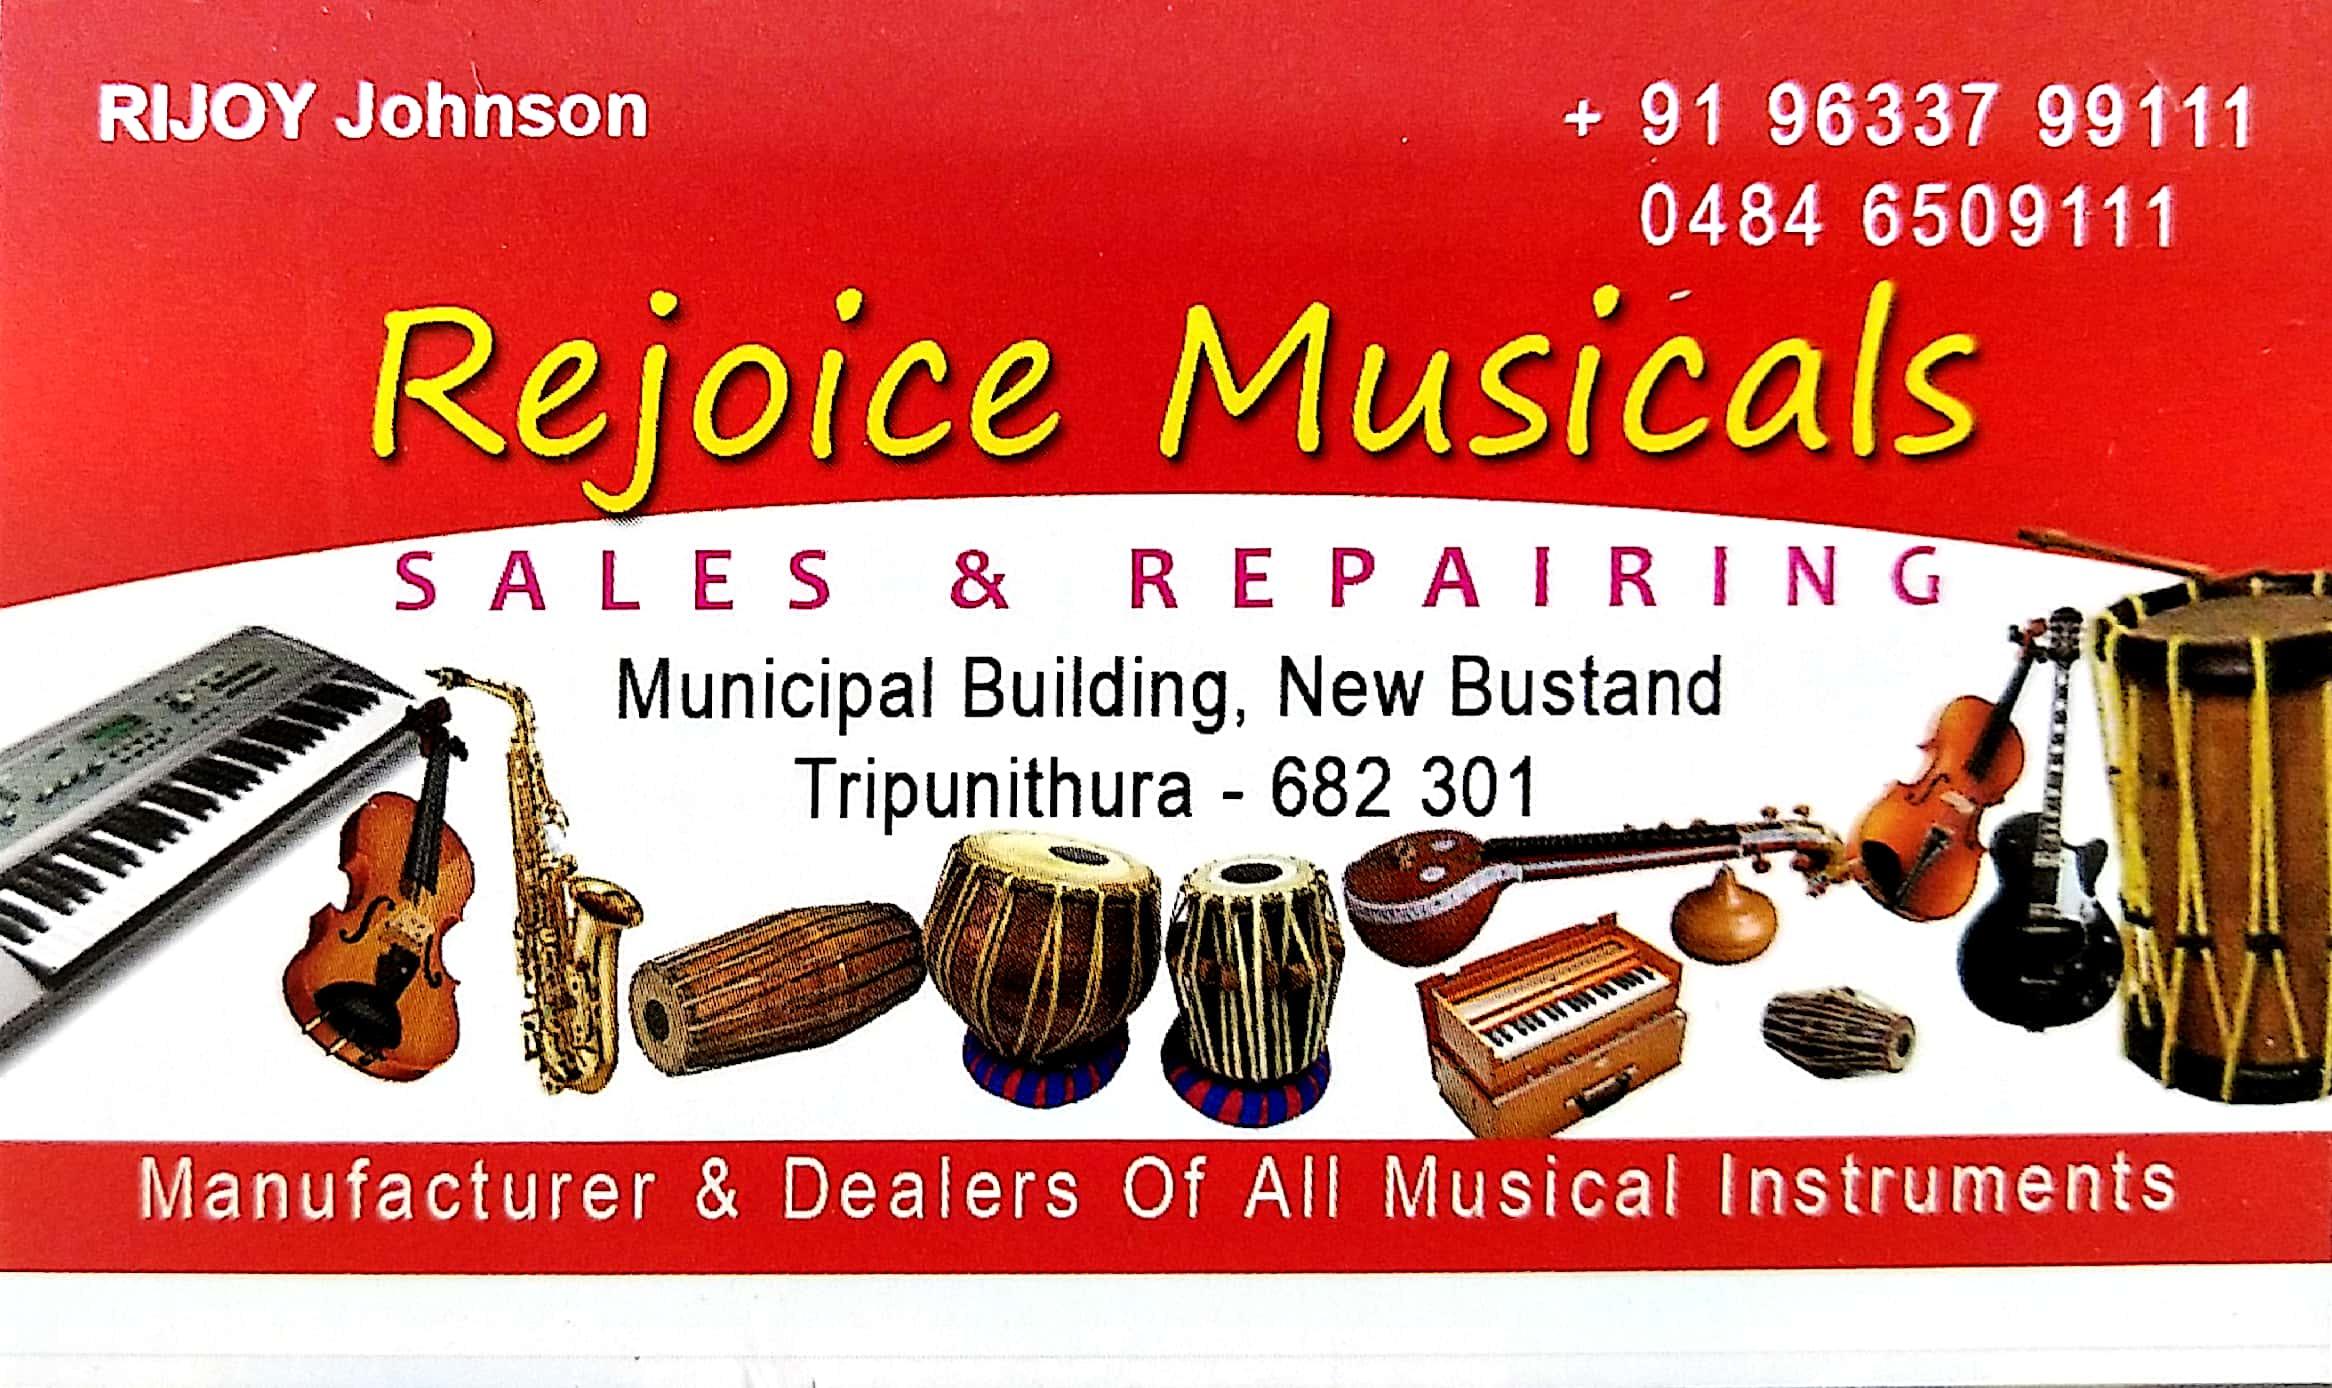 REJOICE MUSICAlS, MUSICAL INSTRUMENTS,  service in Thrippunithura, Ernakulam